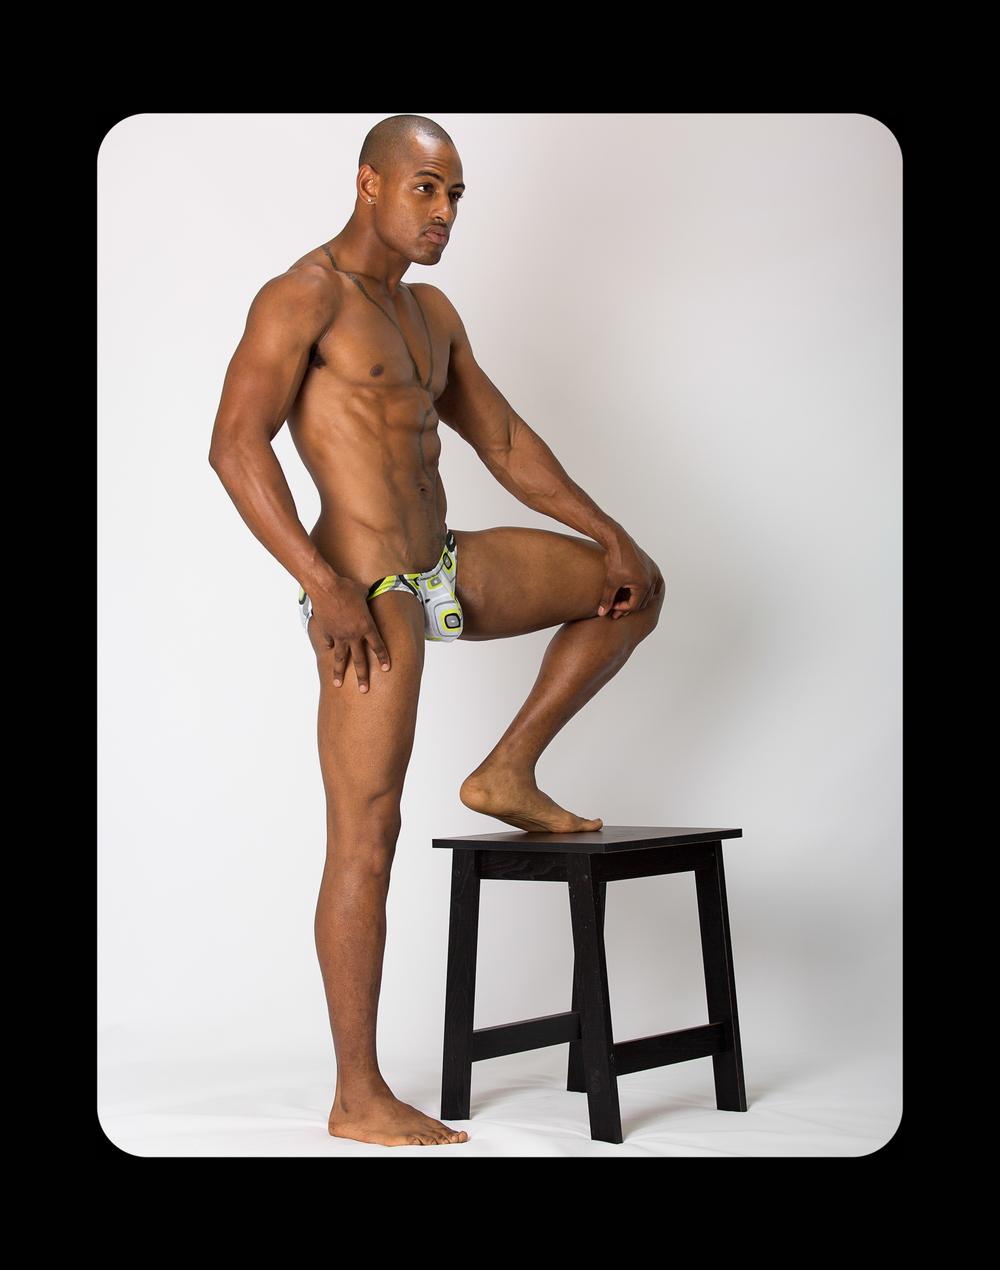 Raul Flores Desins Mens Underwear 2015-1 (dragged) 8.jpg